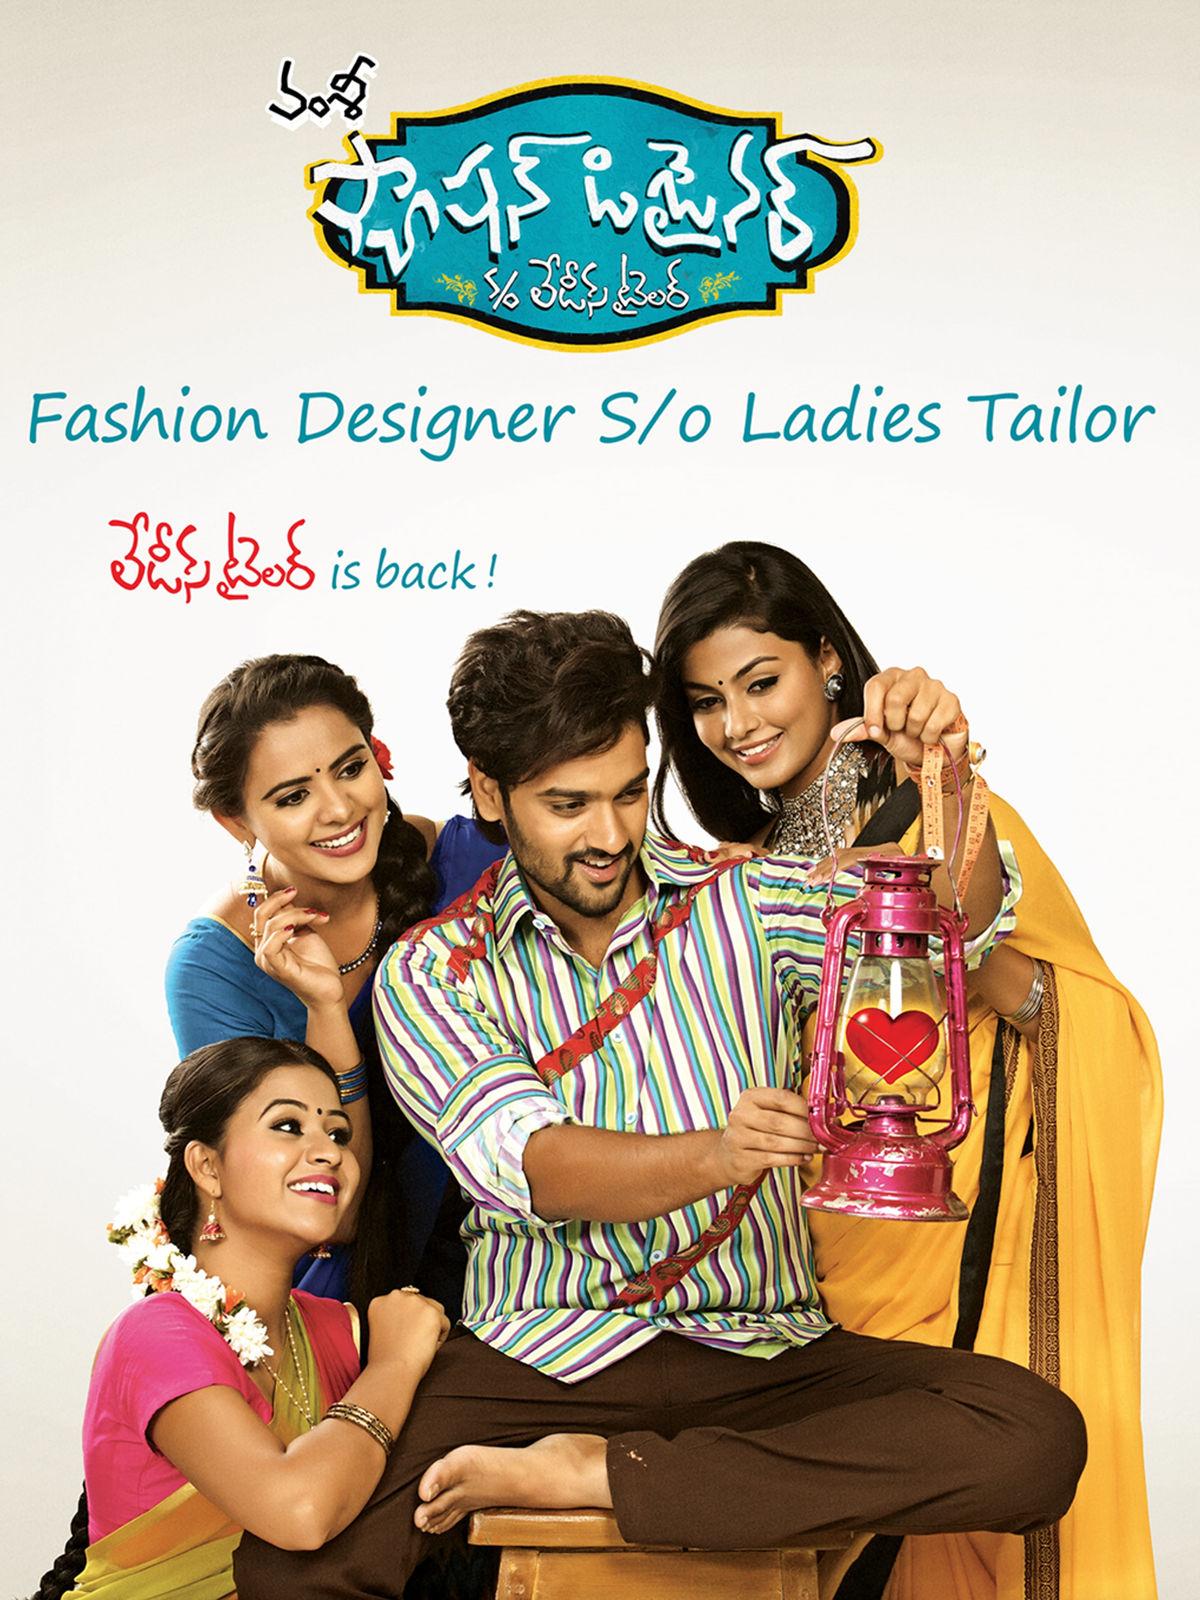 Fashion Designer S/o Ladies Tailor